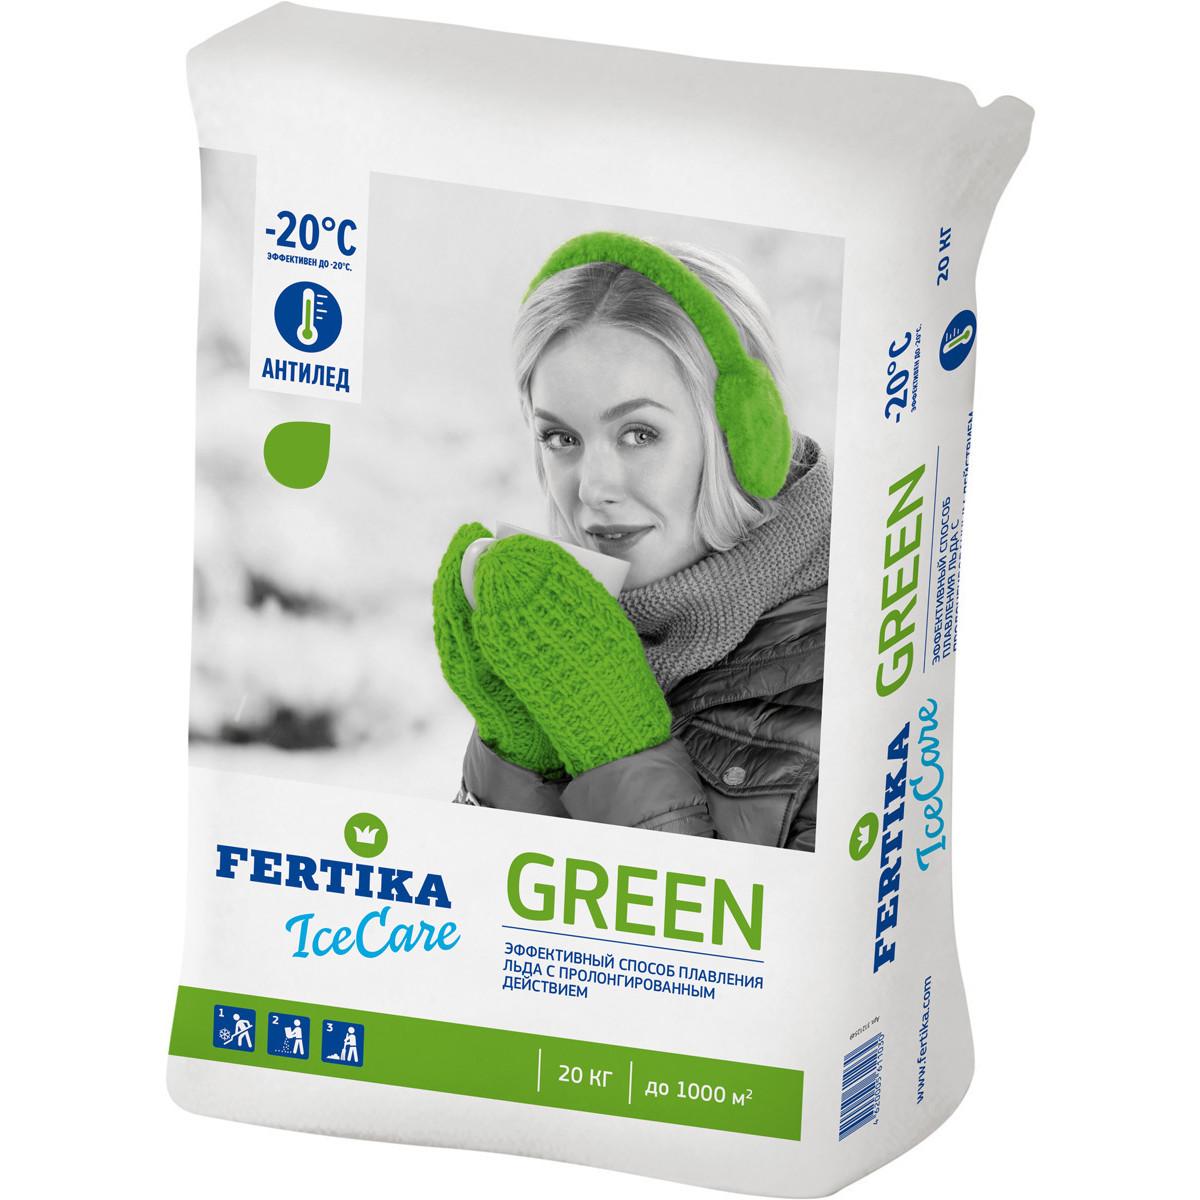 Противогололедное средство Фертика Ice Care Green 20 кг